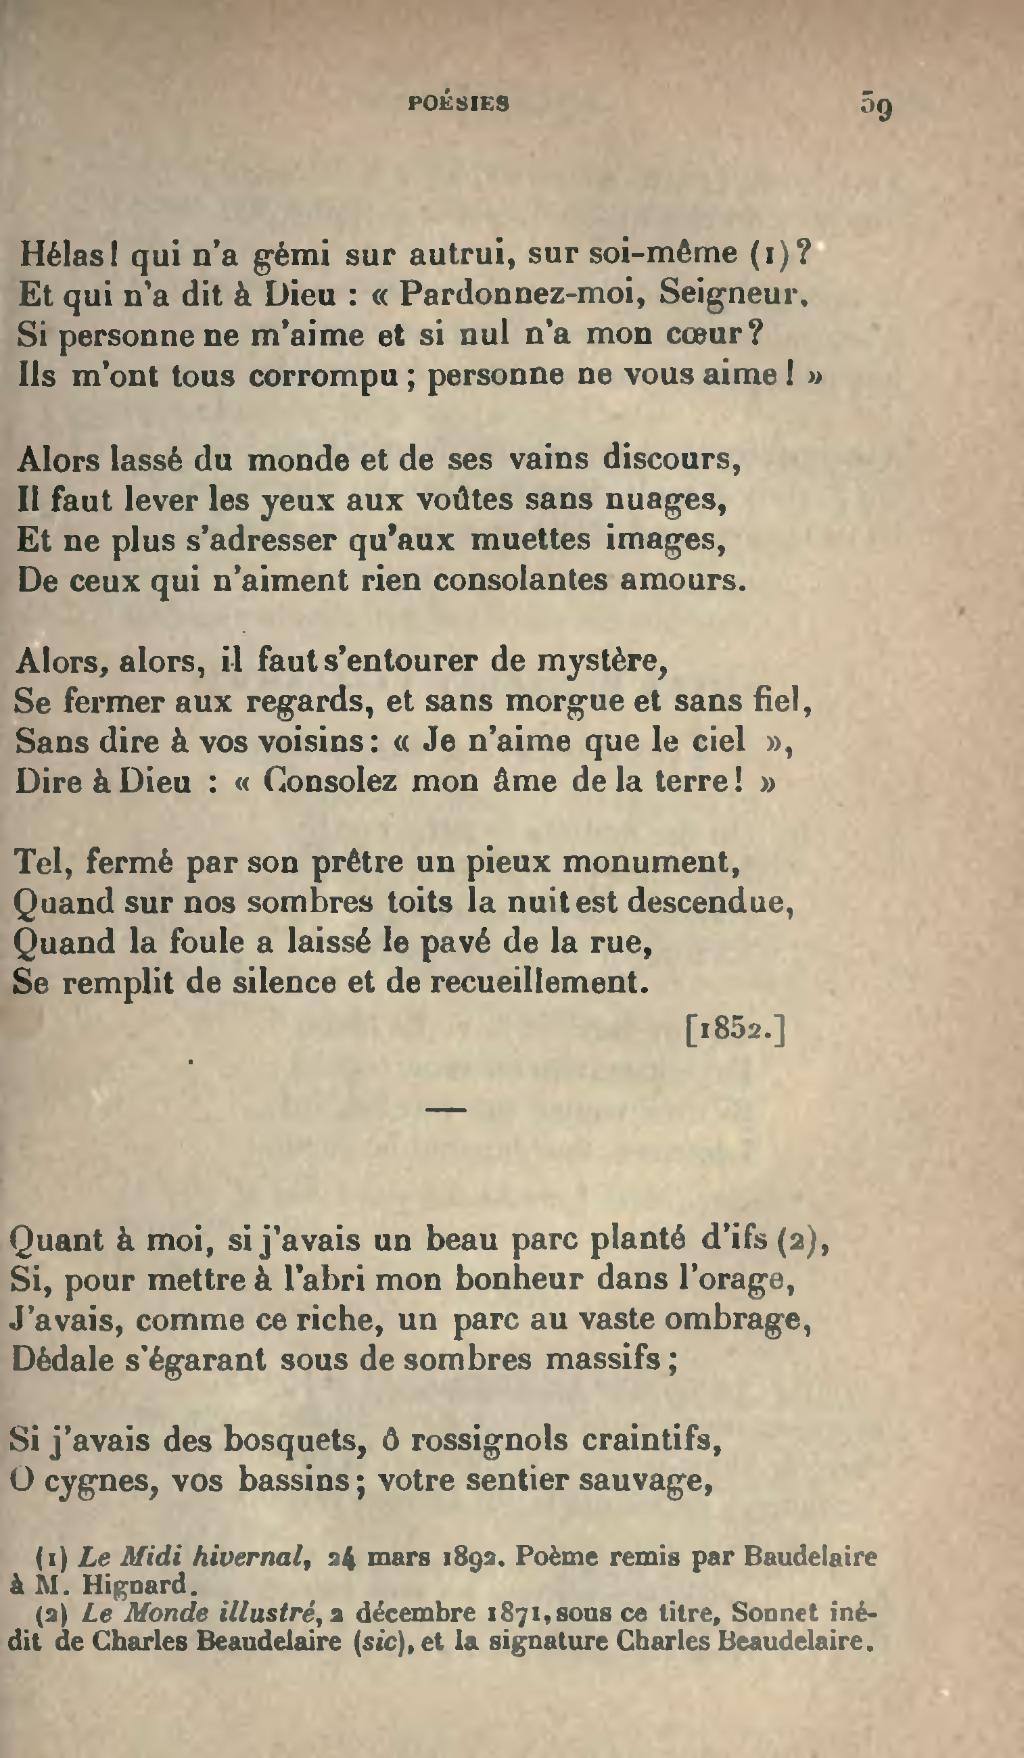 Pagebaudelaire œuvres Posthumes 1908djvu63 Wikisource